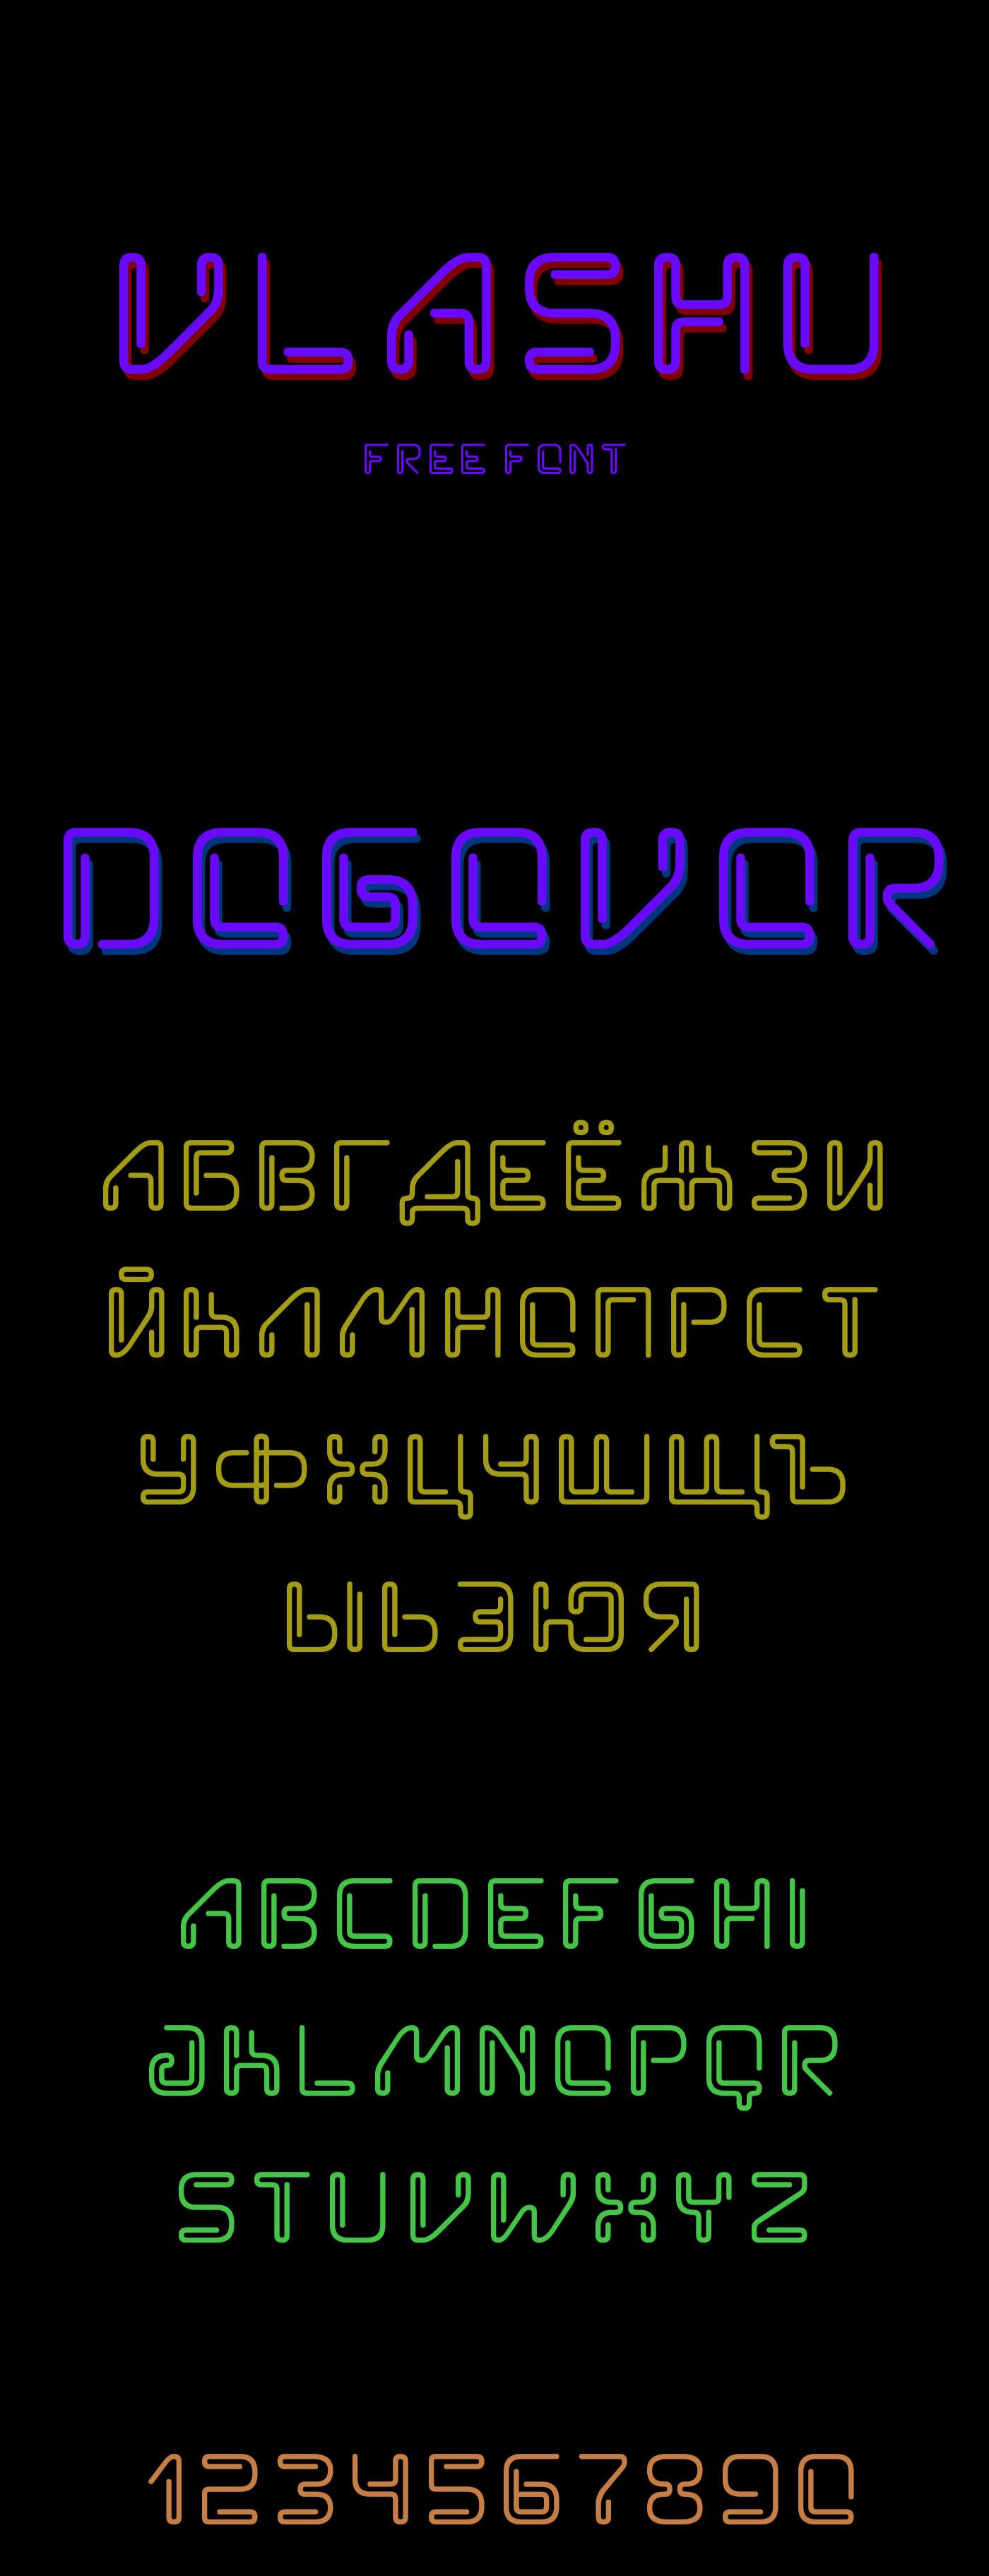 bold Display font free Free font Retro sans serif type Typeface